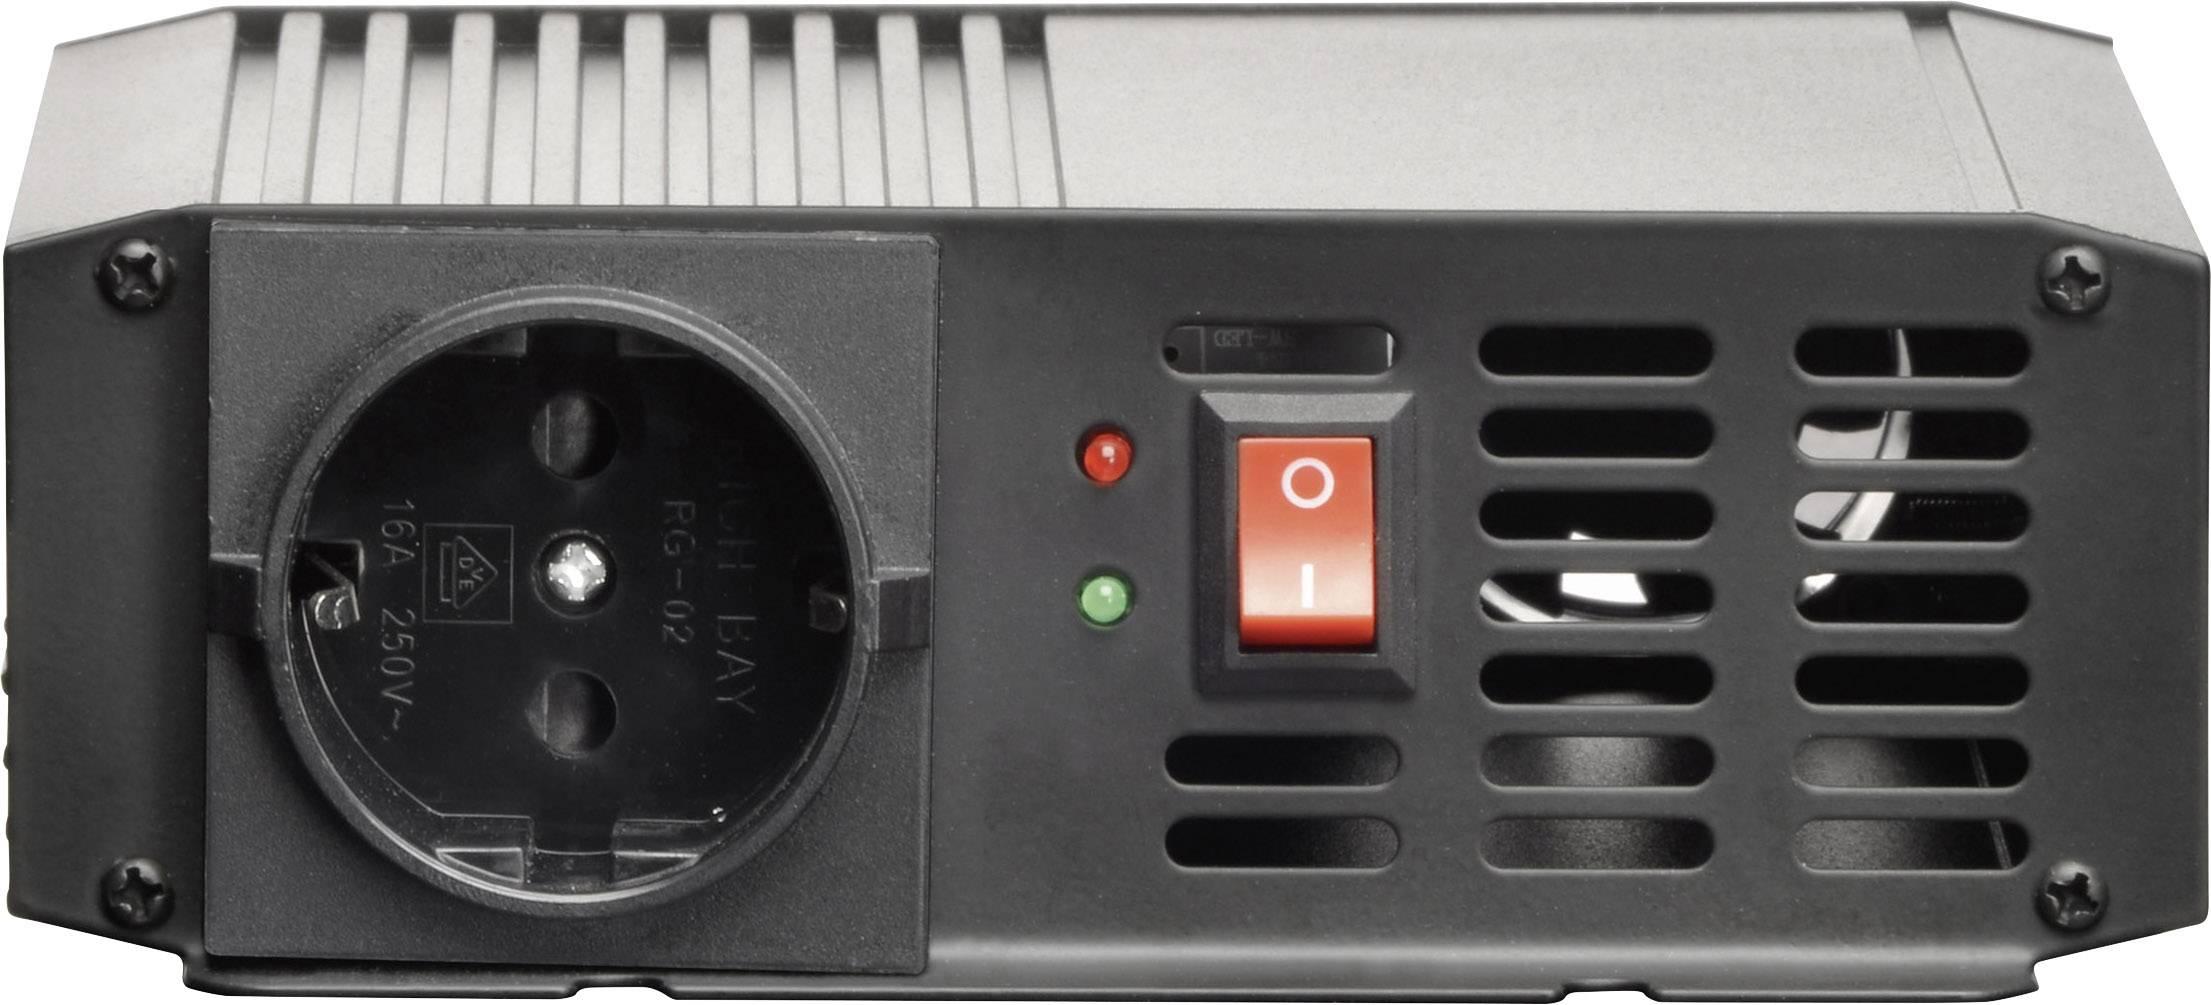 Menič napätia Voltcraft PSW 300-12-G, 12 V / DC, 300 W